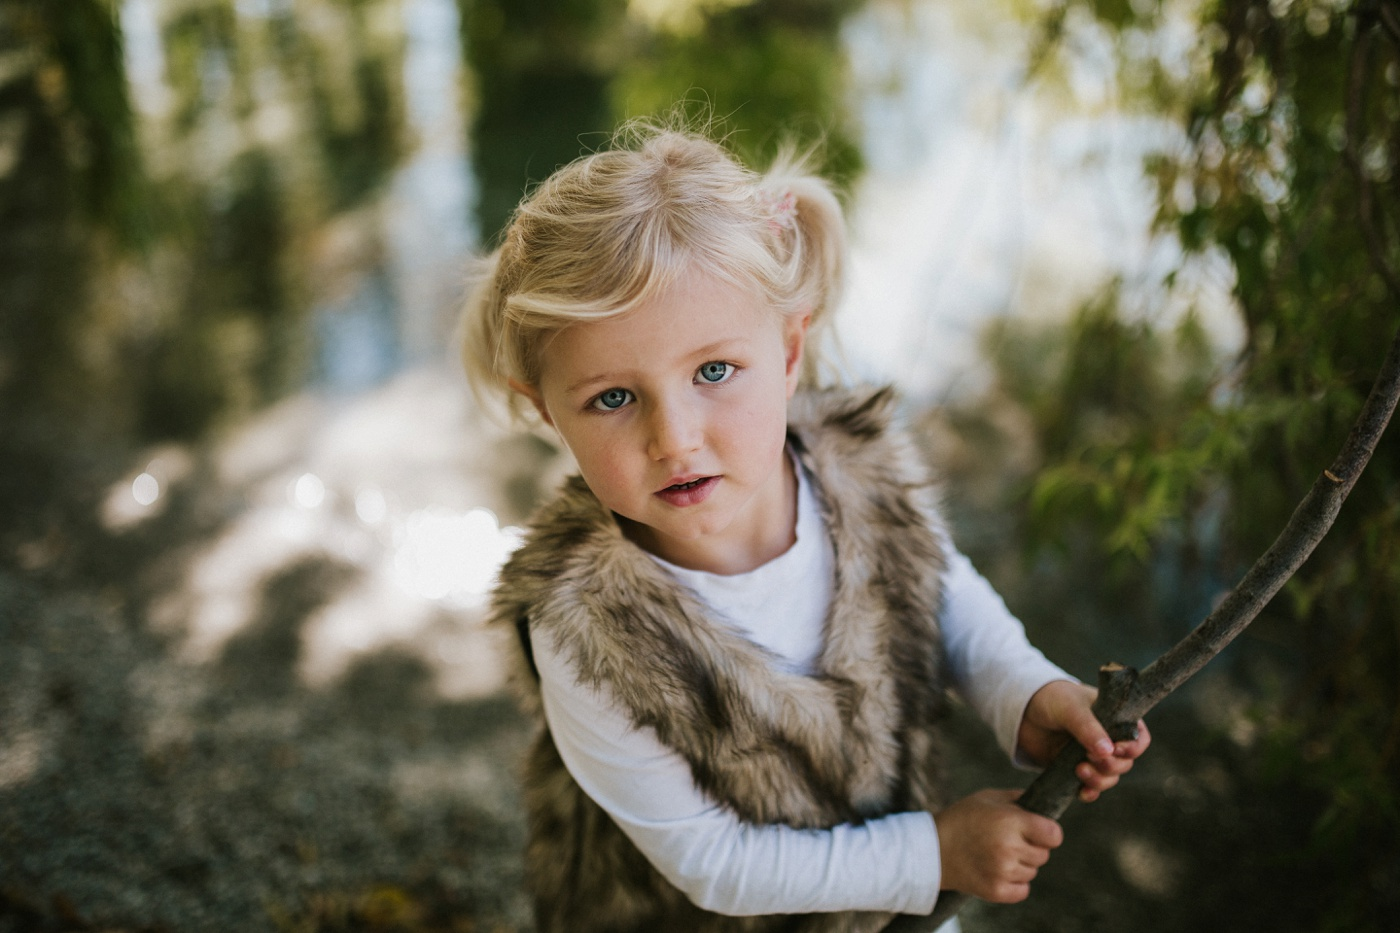 Blake-Lily-Rolig-Lekfull-Familjesession-Familjefotograf-Stockholm-Orebro_03